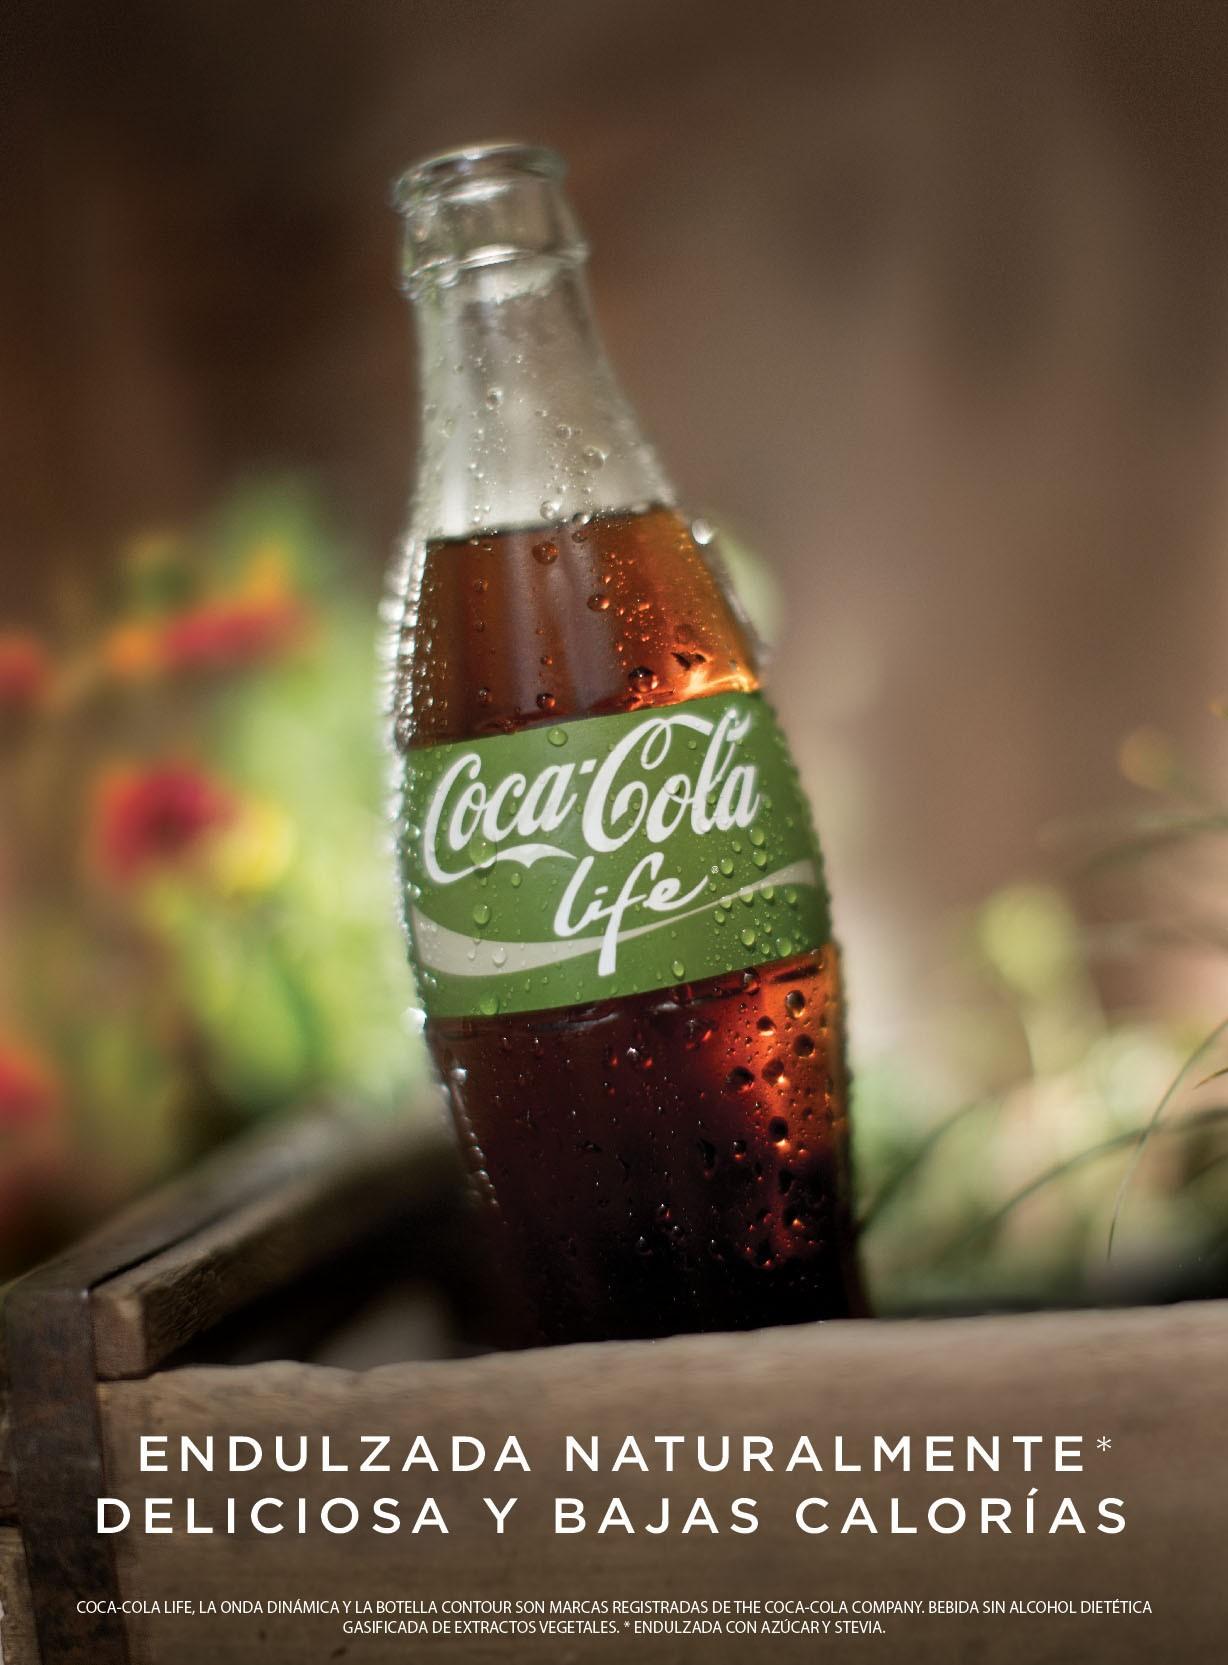 Coca-Cola Life, le nouveau Coca-Cola à base de stevia